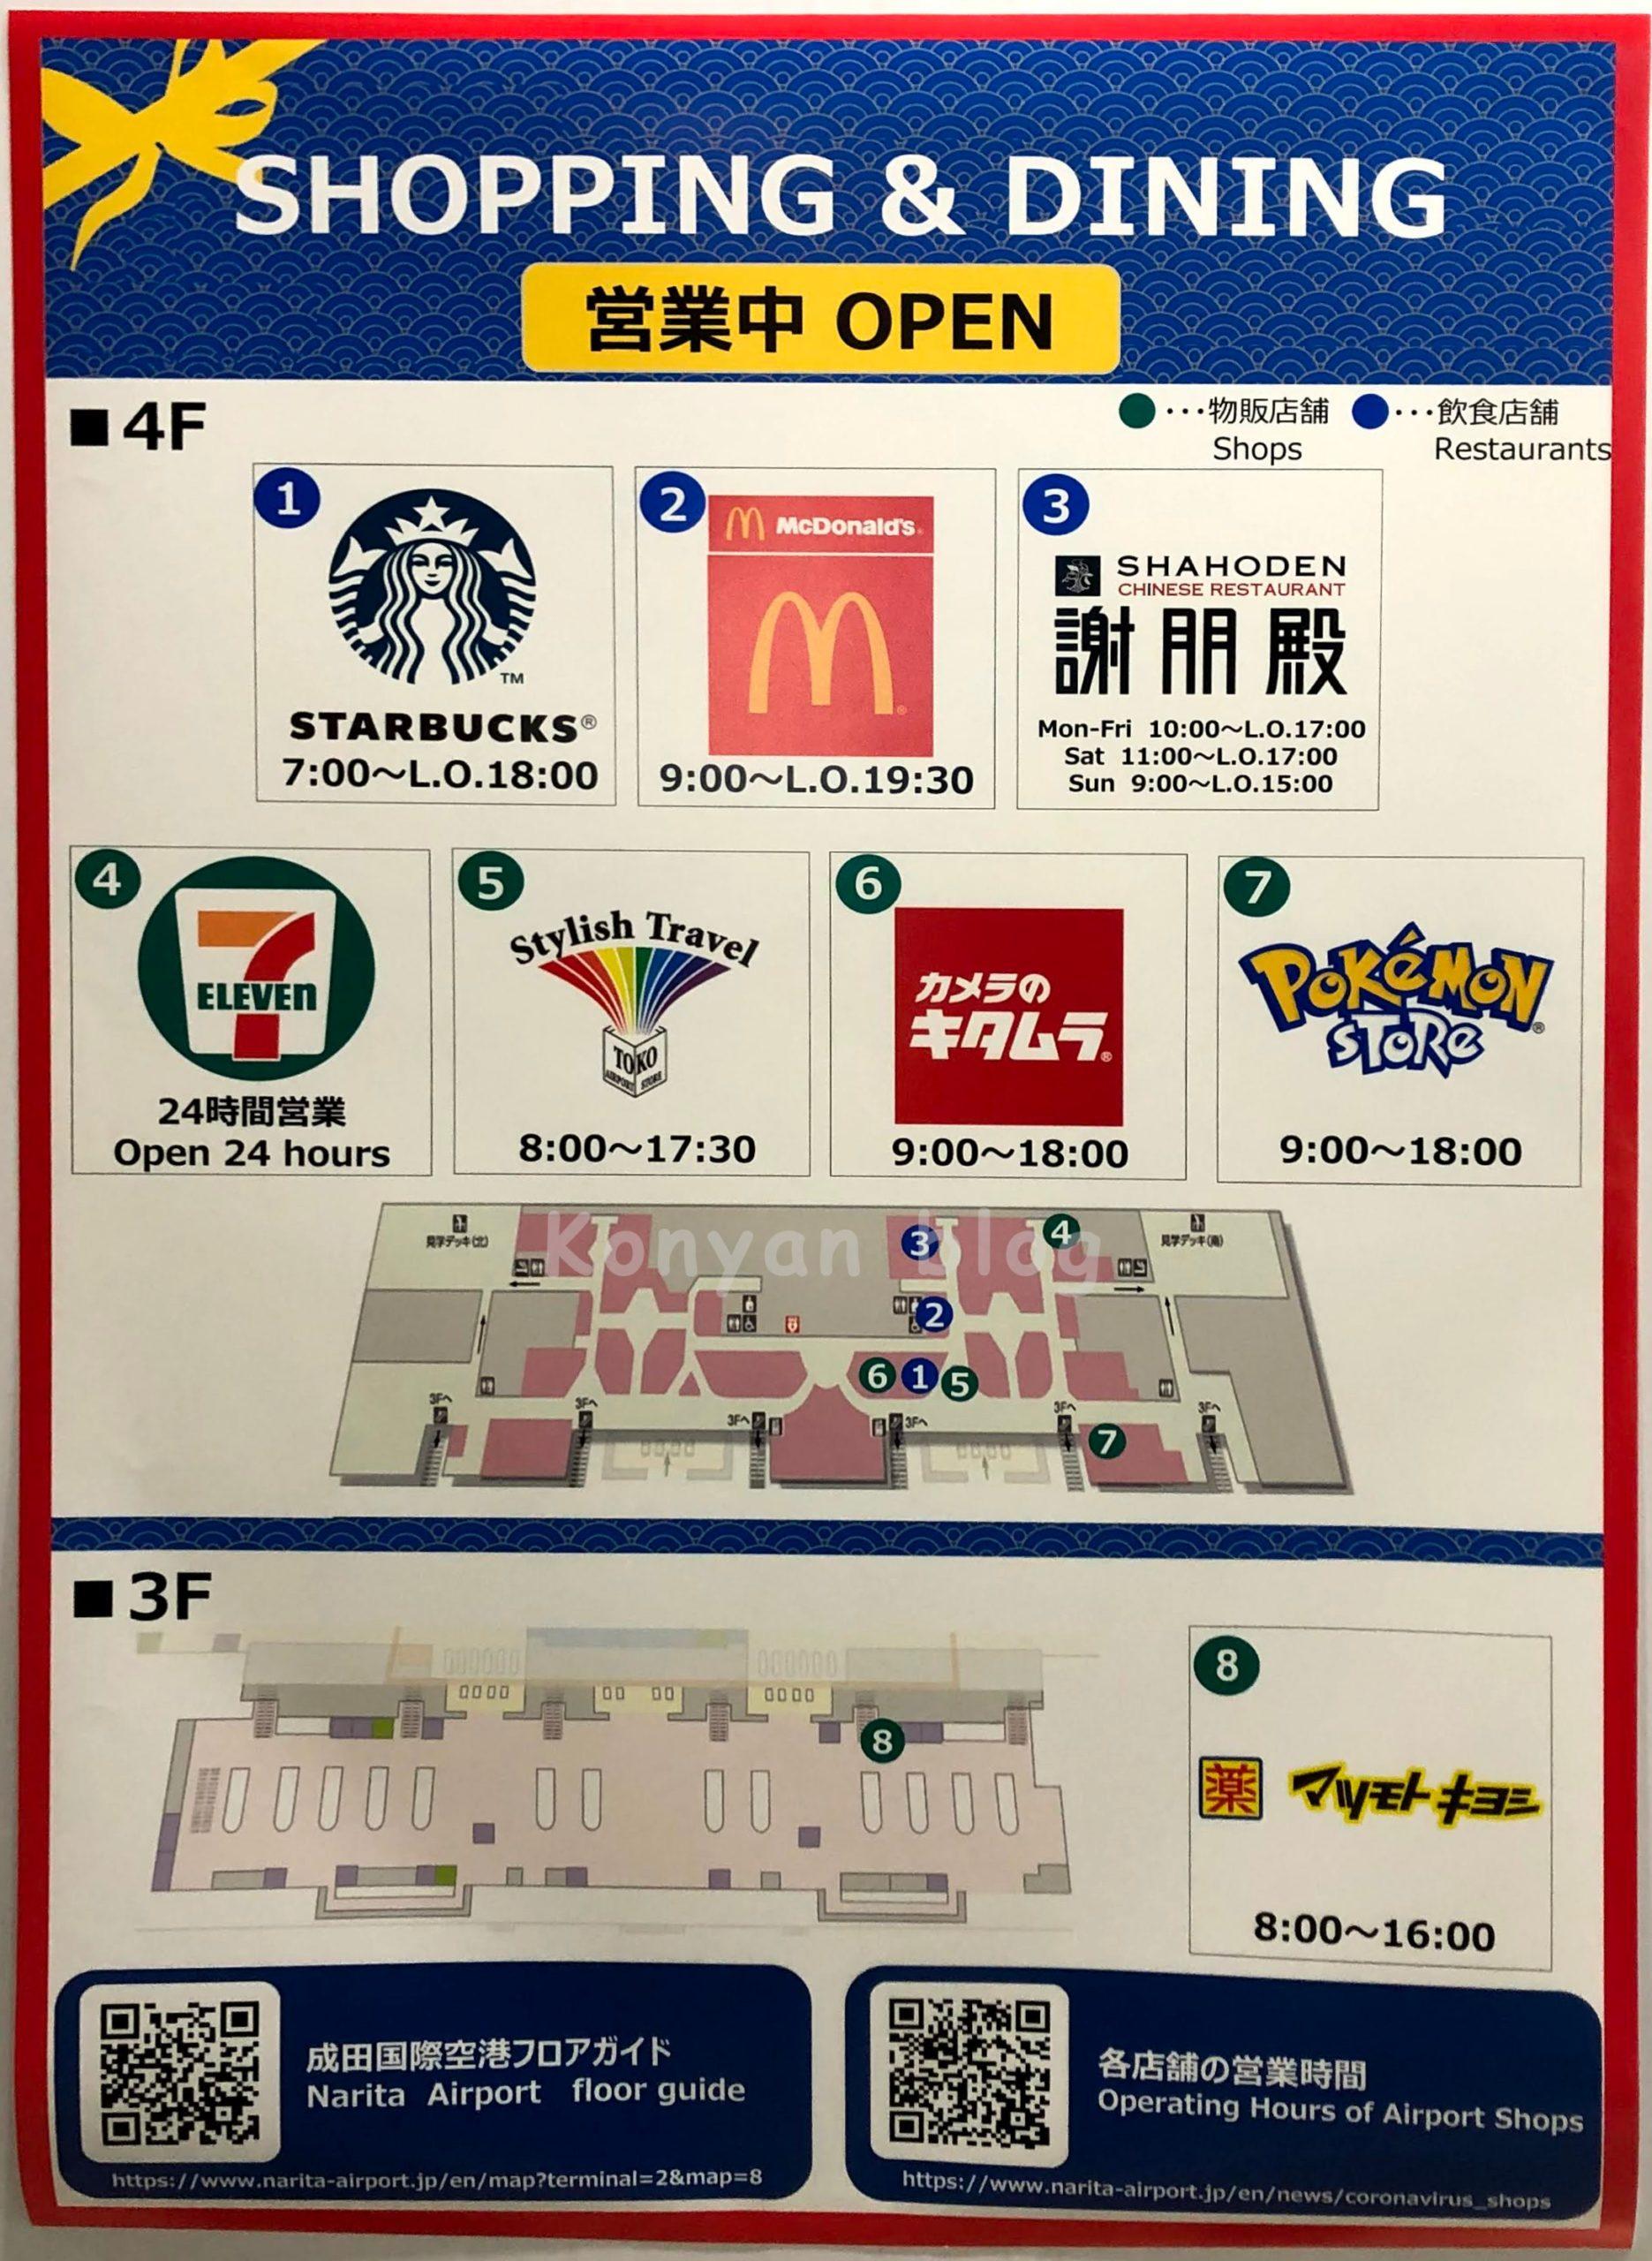 成田空港 4階 お店一覧